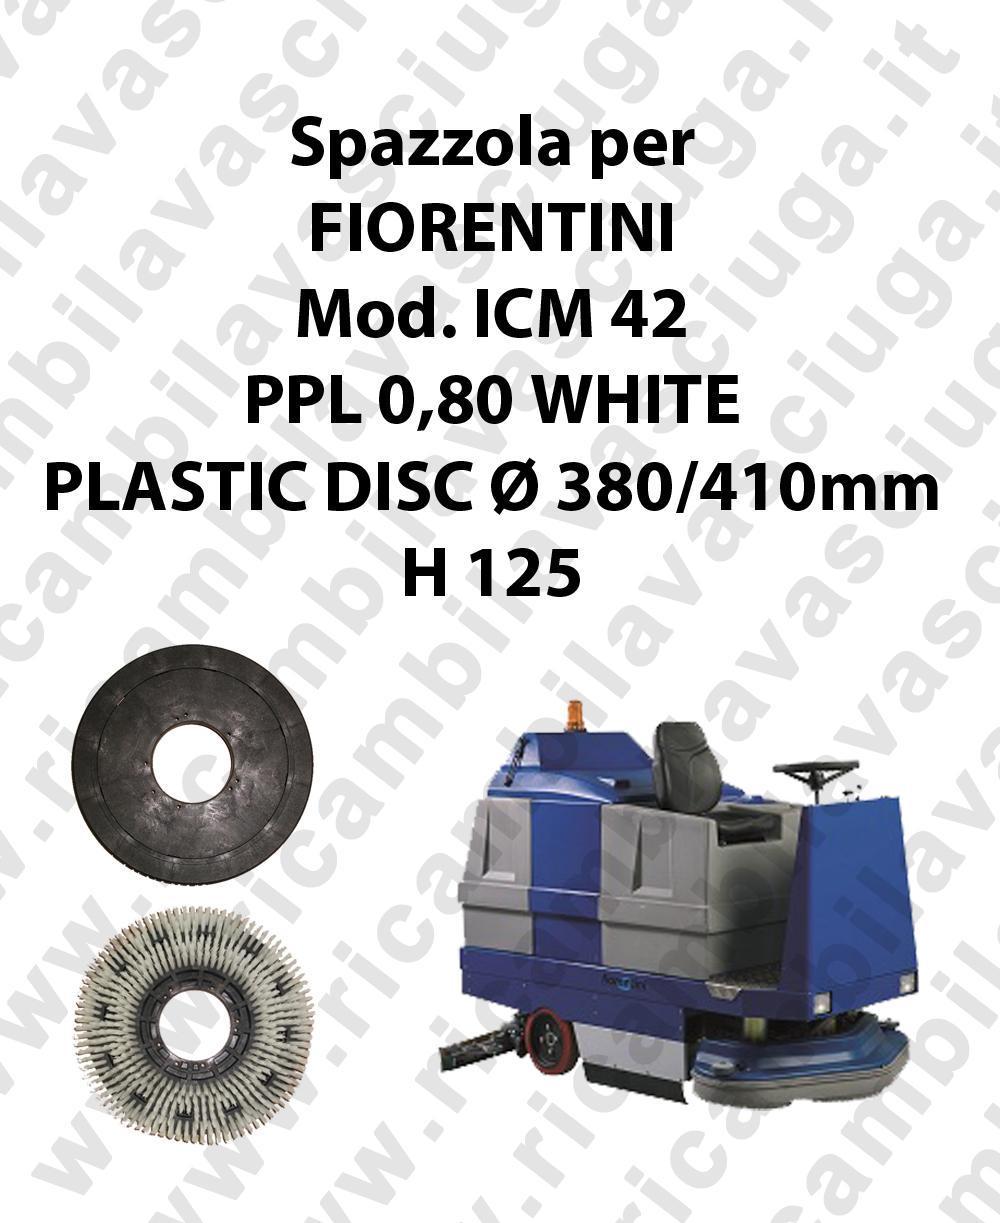 Cleaning Brush PPL 0,80 WHITE for scrubber dryer FIORENTINI Model ICM 42